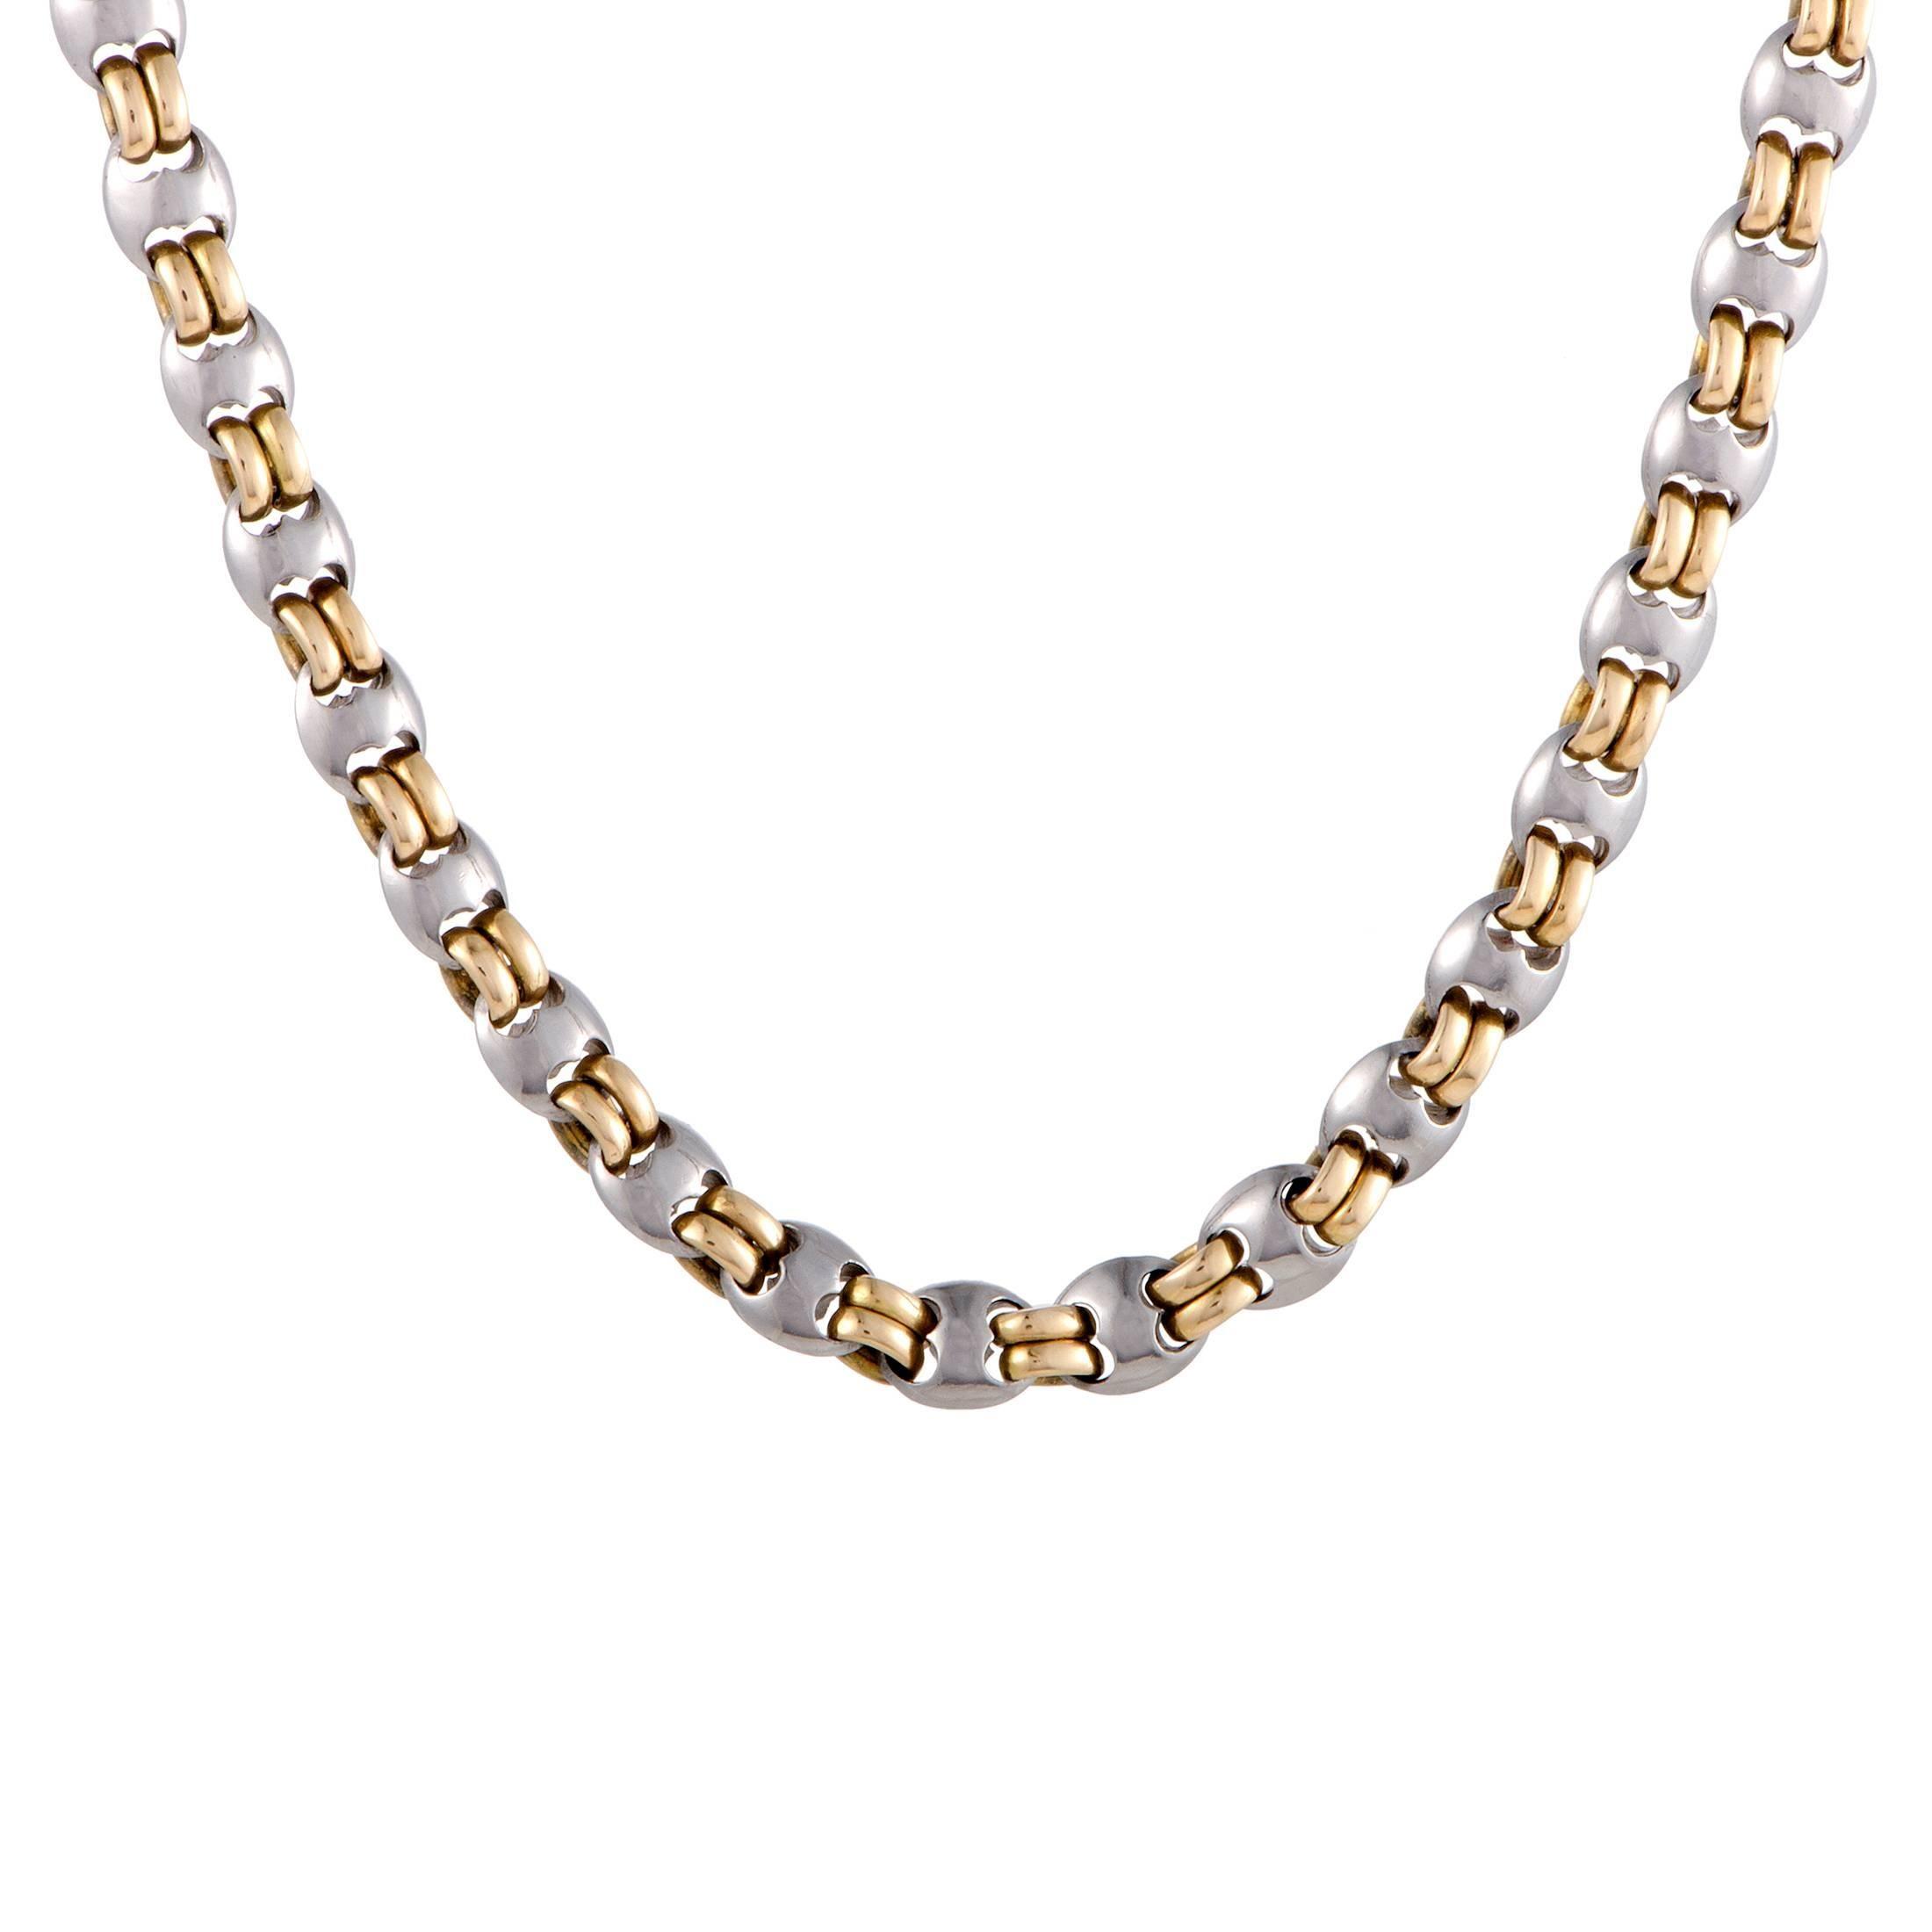 bulgari menu0027s yellow and white gold chain necklace